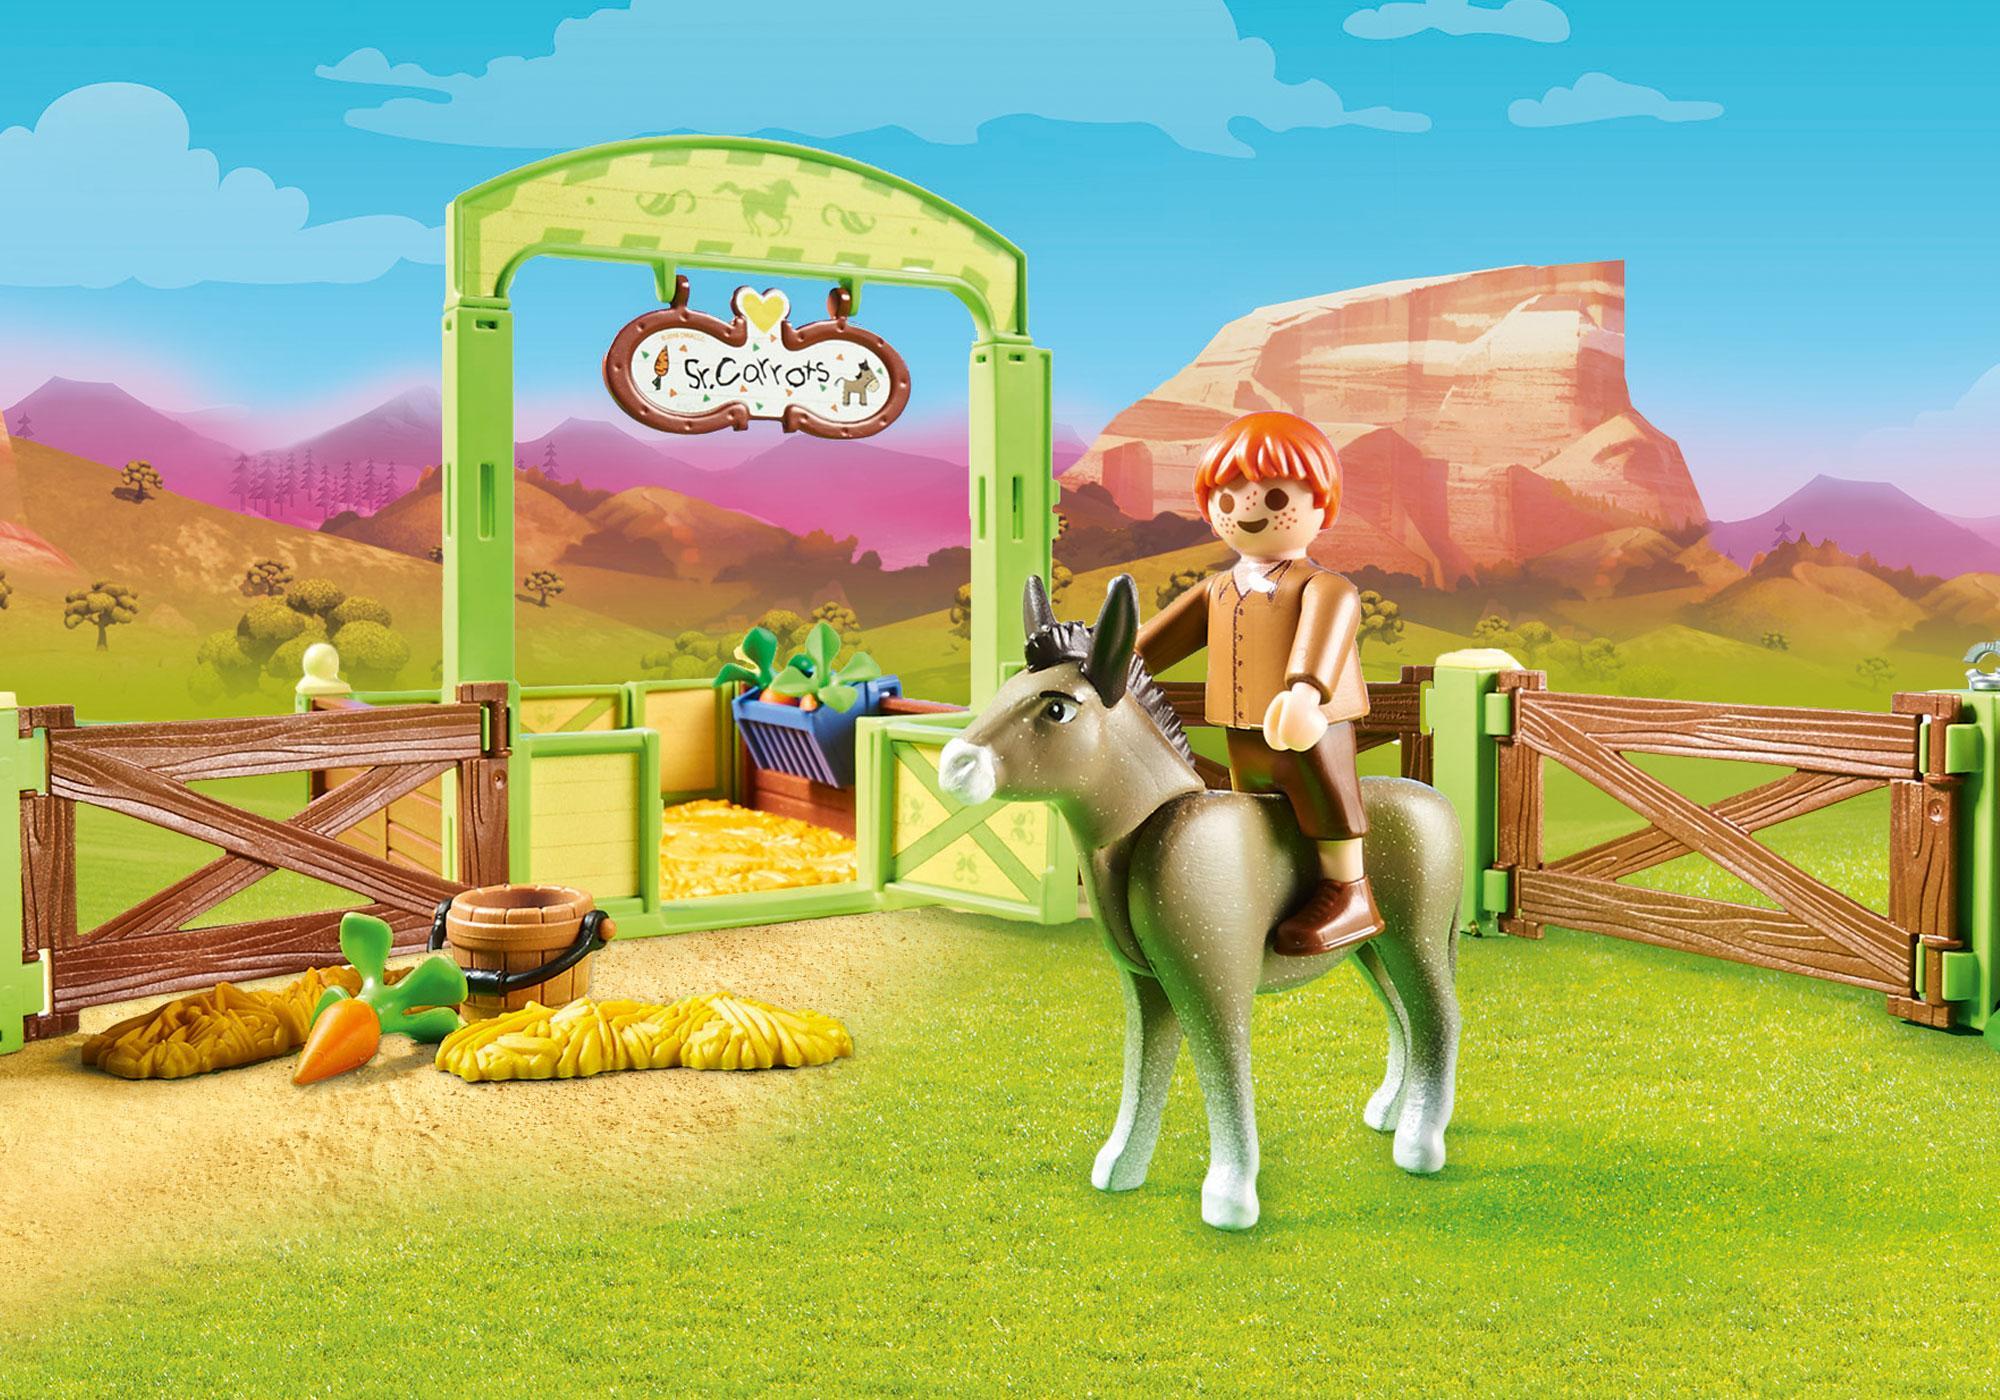 http://media.playmobil.com/i/playmobil/70120_product_extra1/Knip en Meneer Worteltjes met paardenbox